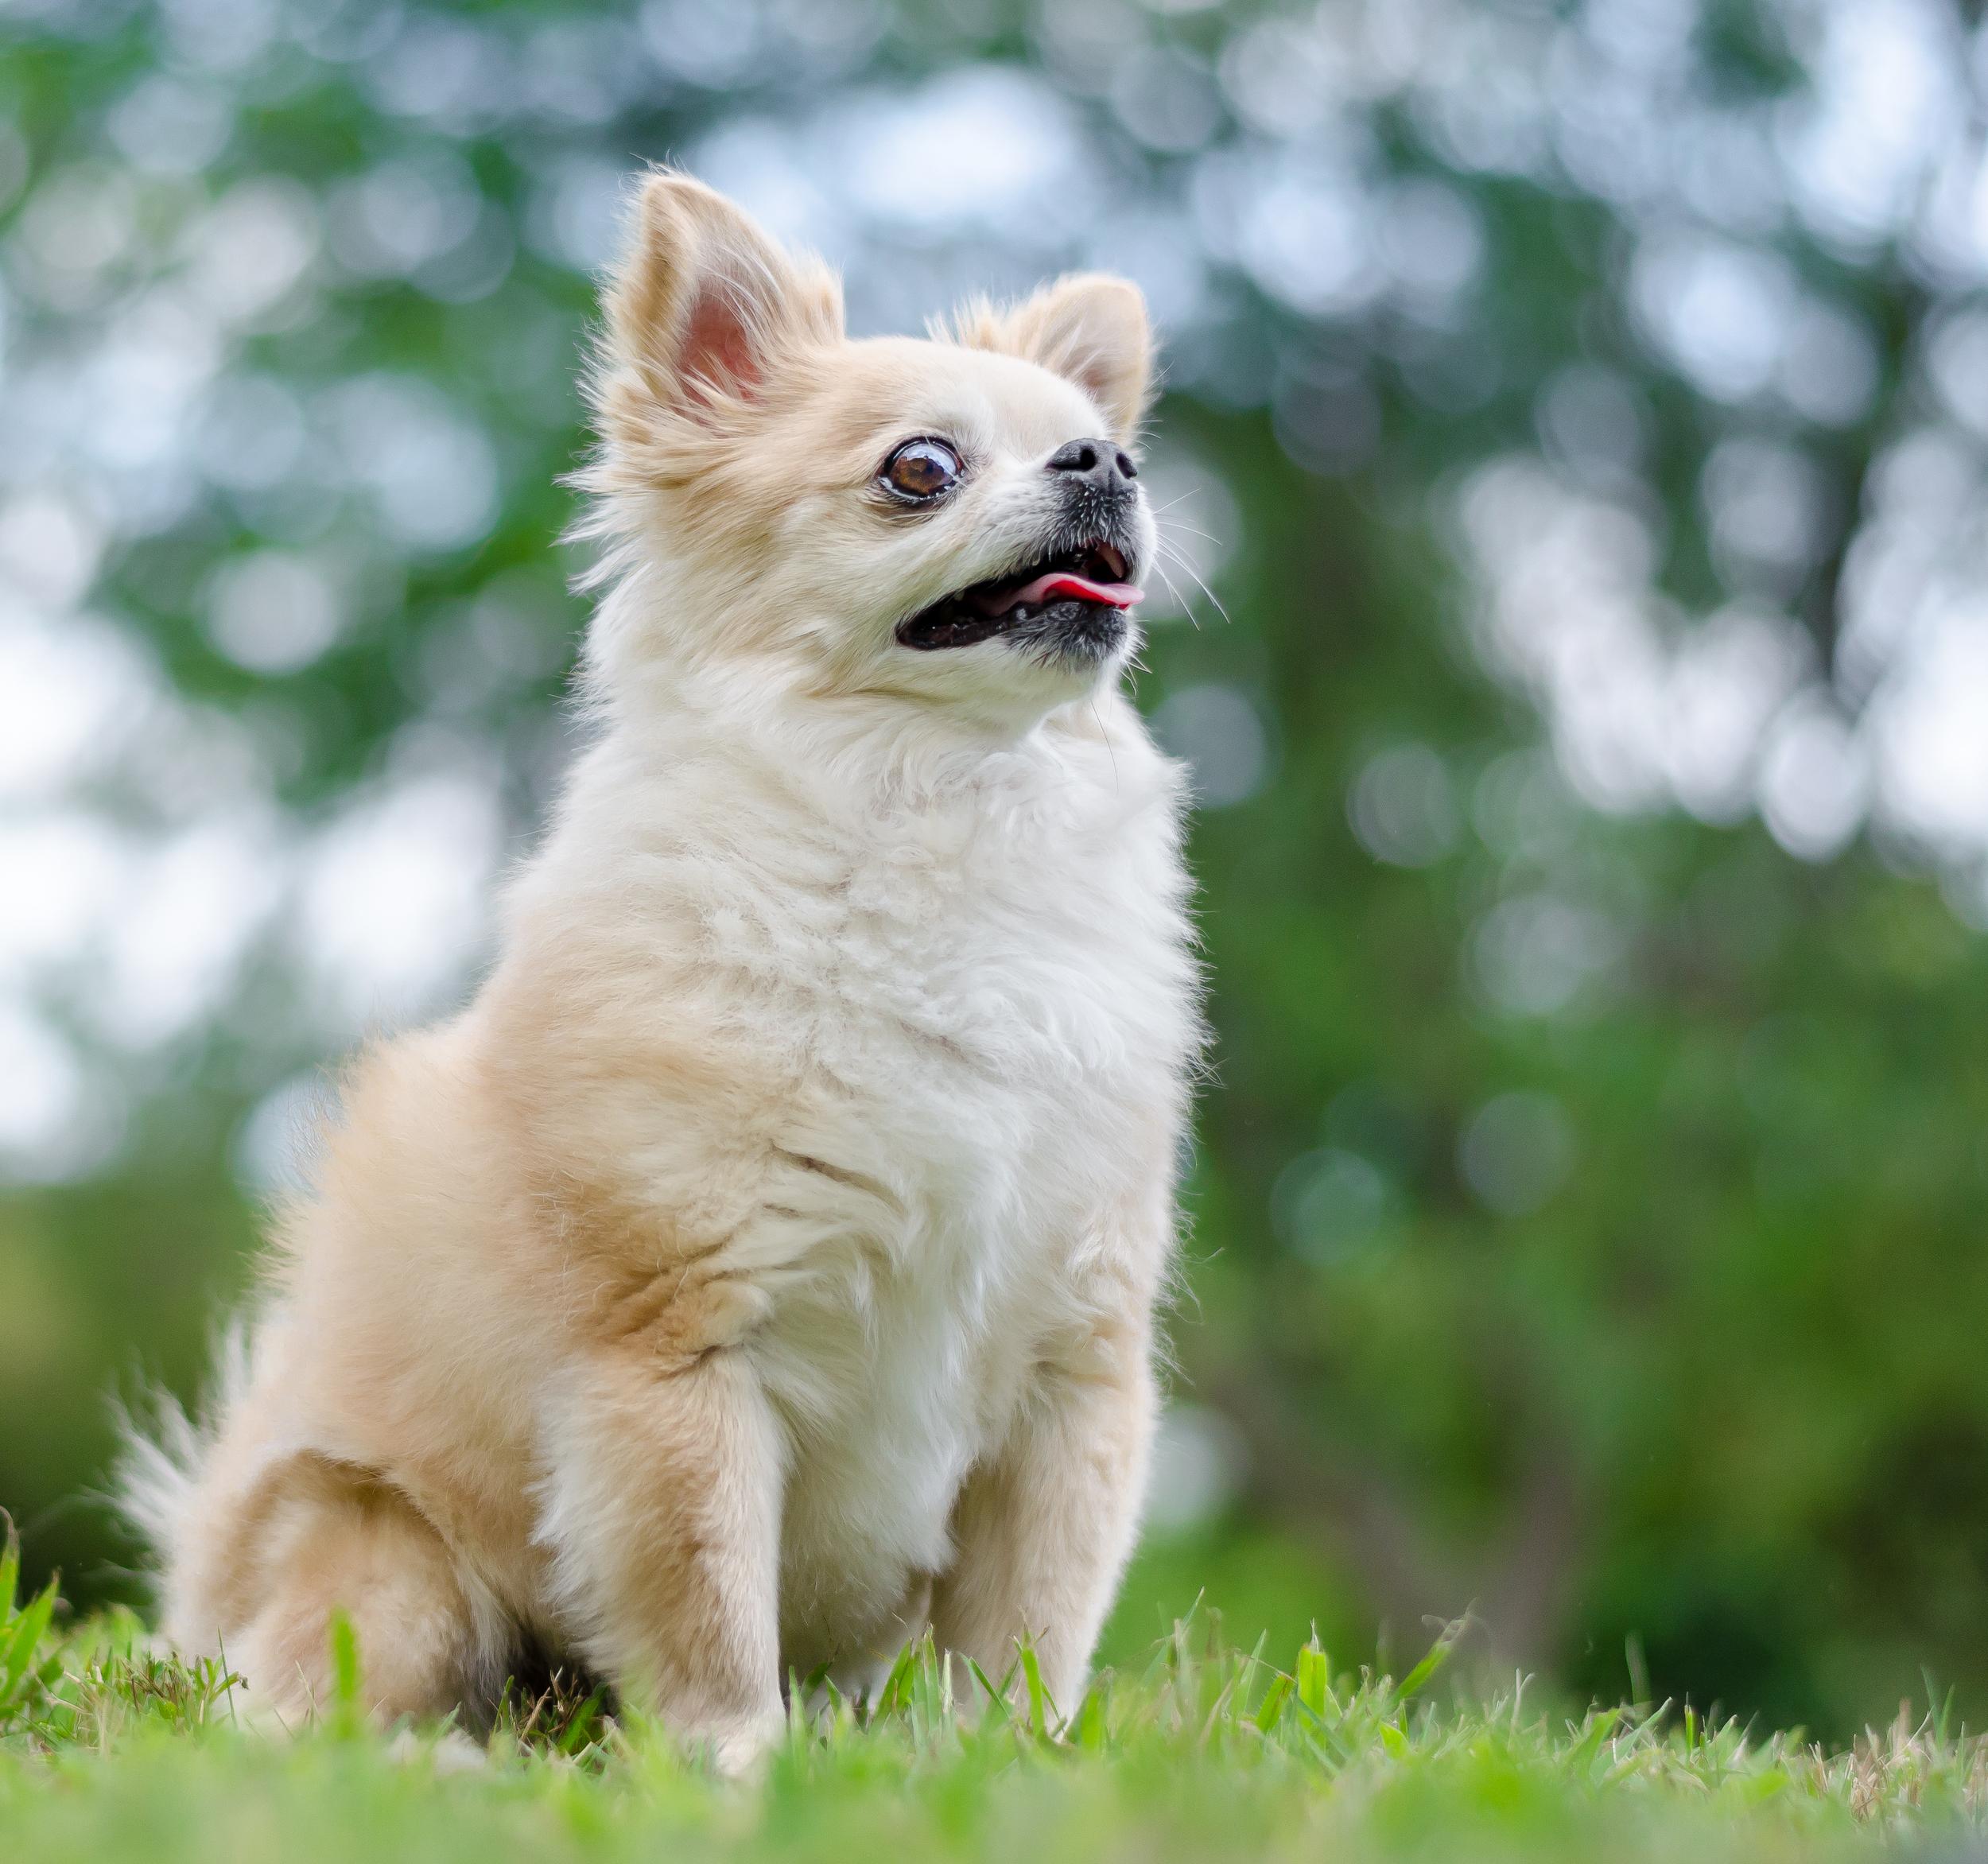 Linnea Smith, Mr. Jingles, dog, Chihuahua-59.jpg